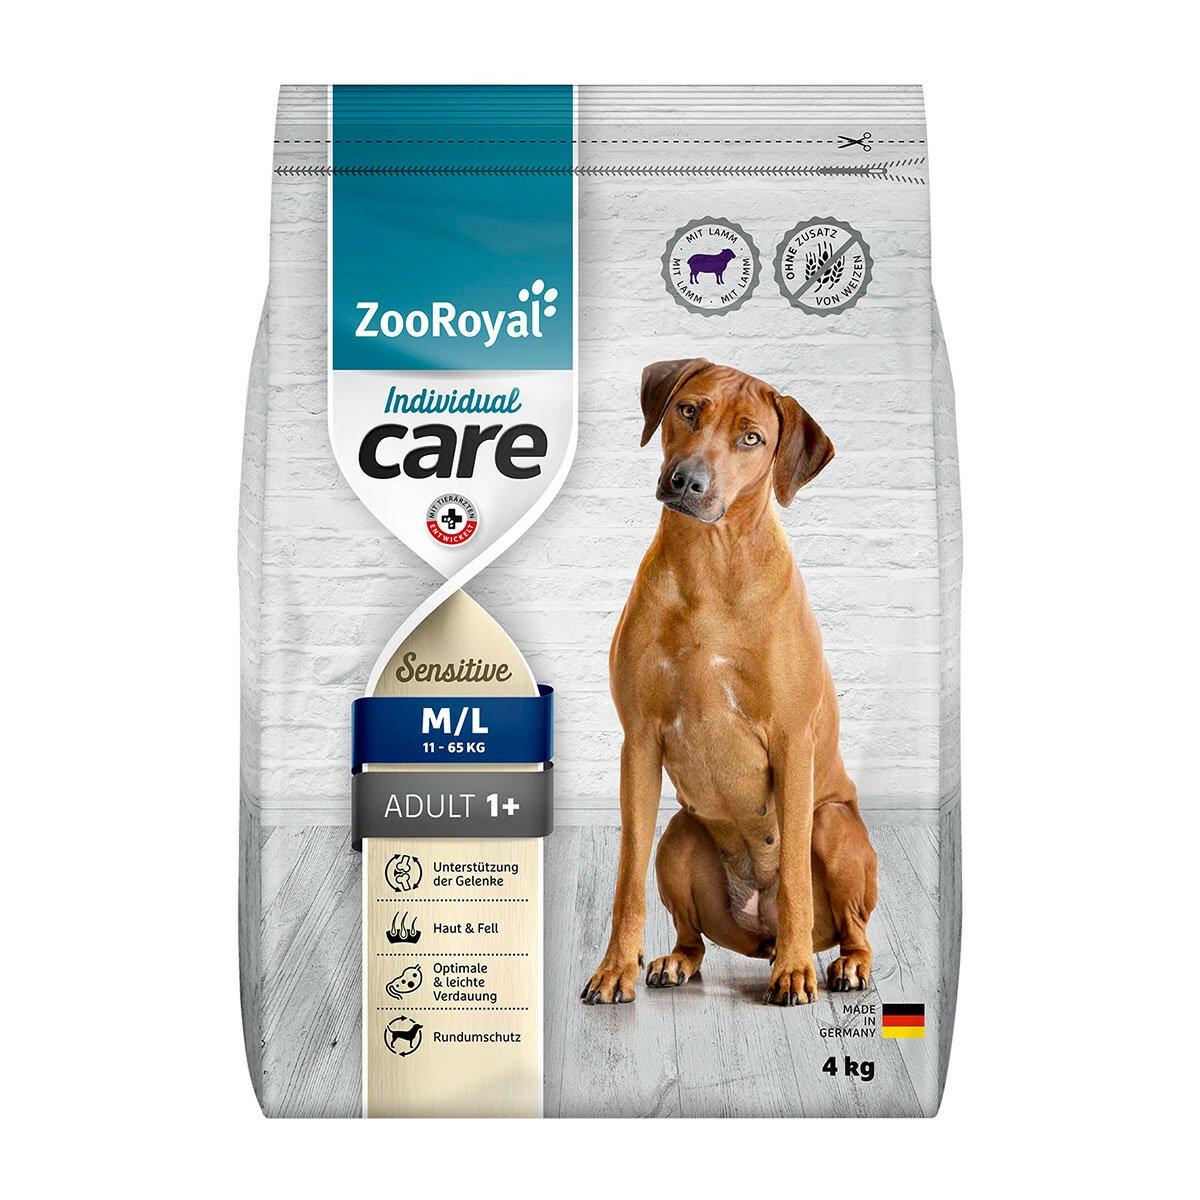 Bild 1 von ZooRoyal Individual care - Adult Sensitive mit Lamm